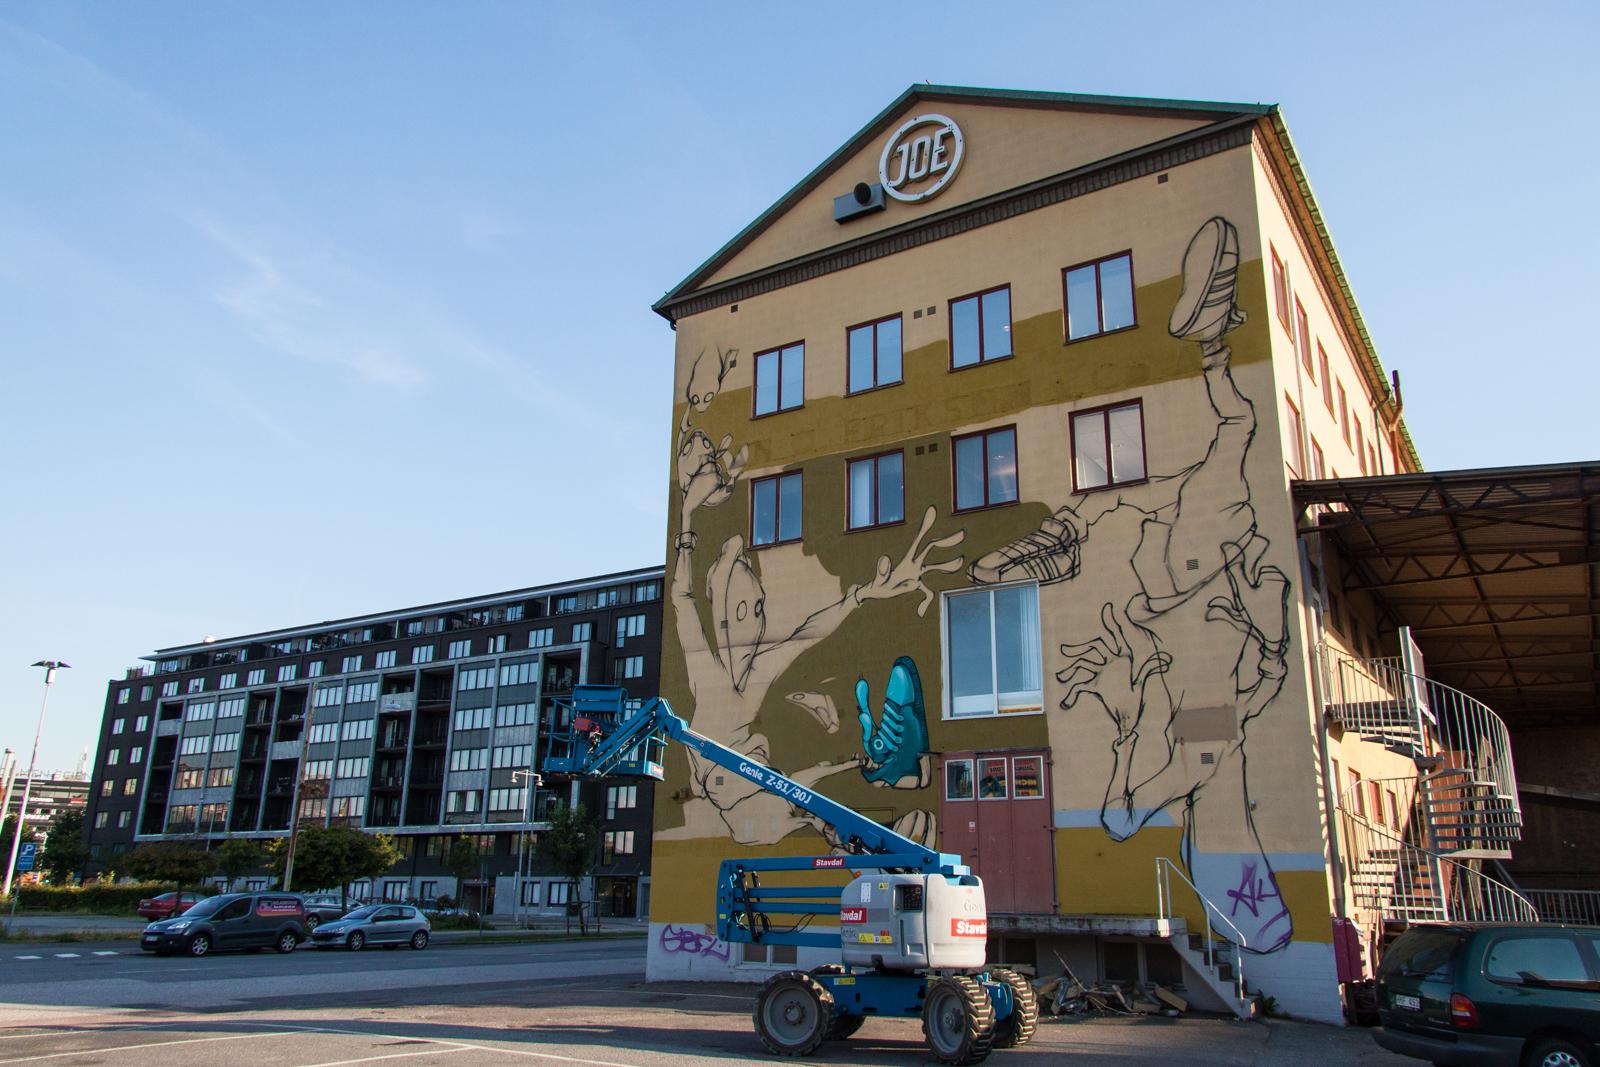 BLESS_Artscape_2016-07-26_FredrikÅkerberg_1600x1067_10.jpg